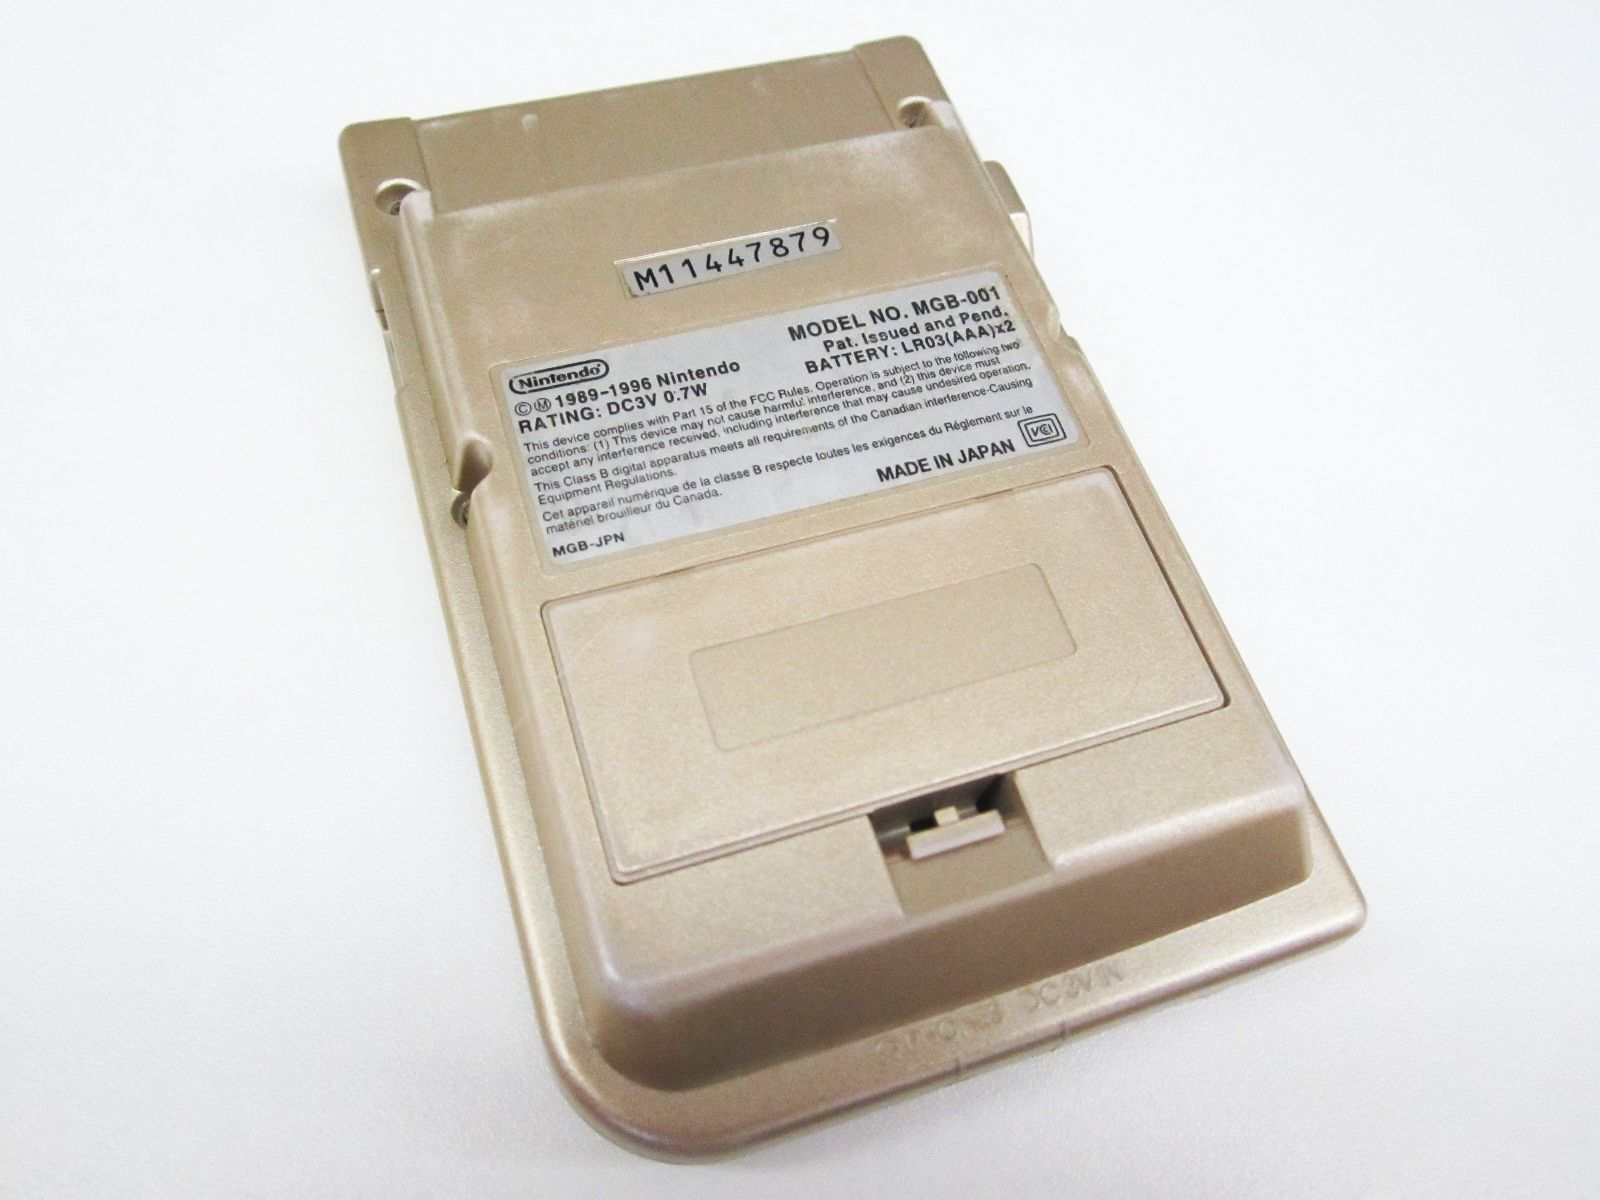 Game Boy Pocket Gold Console MGB 001 Retro Handheld 879